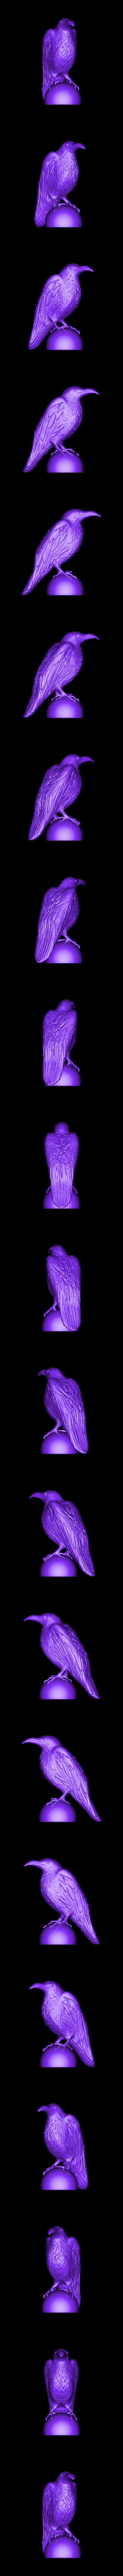 416+Raven.stl Download free STL file Raven - 3D Prophecy - Season 4, Episode 16 - Crossing • 3D printable template, 3DBROOKLYN